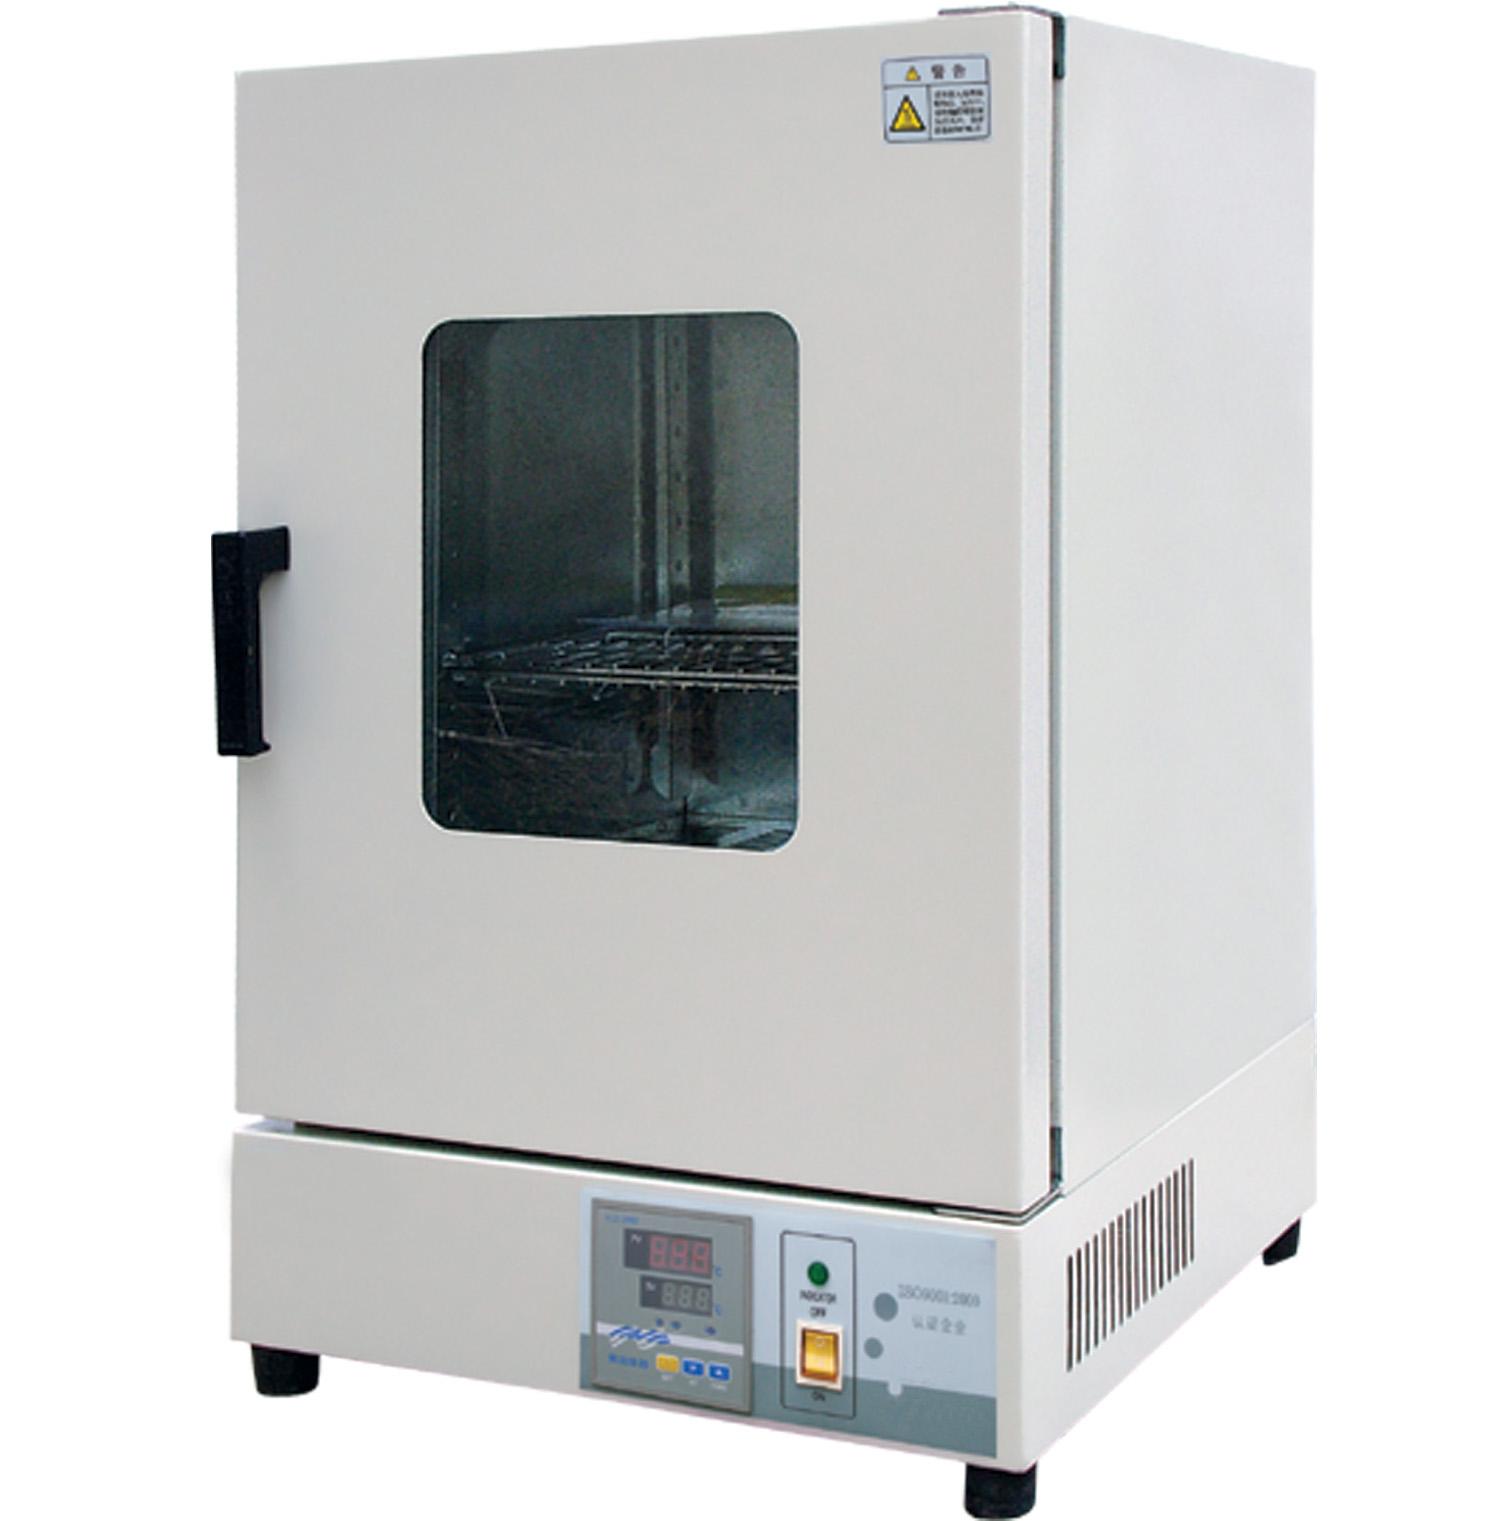 101-1as(101a-1s)数显不锈钢内胆鼓风干燥箱